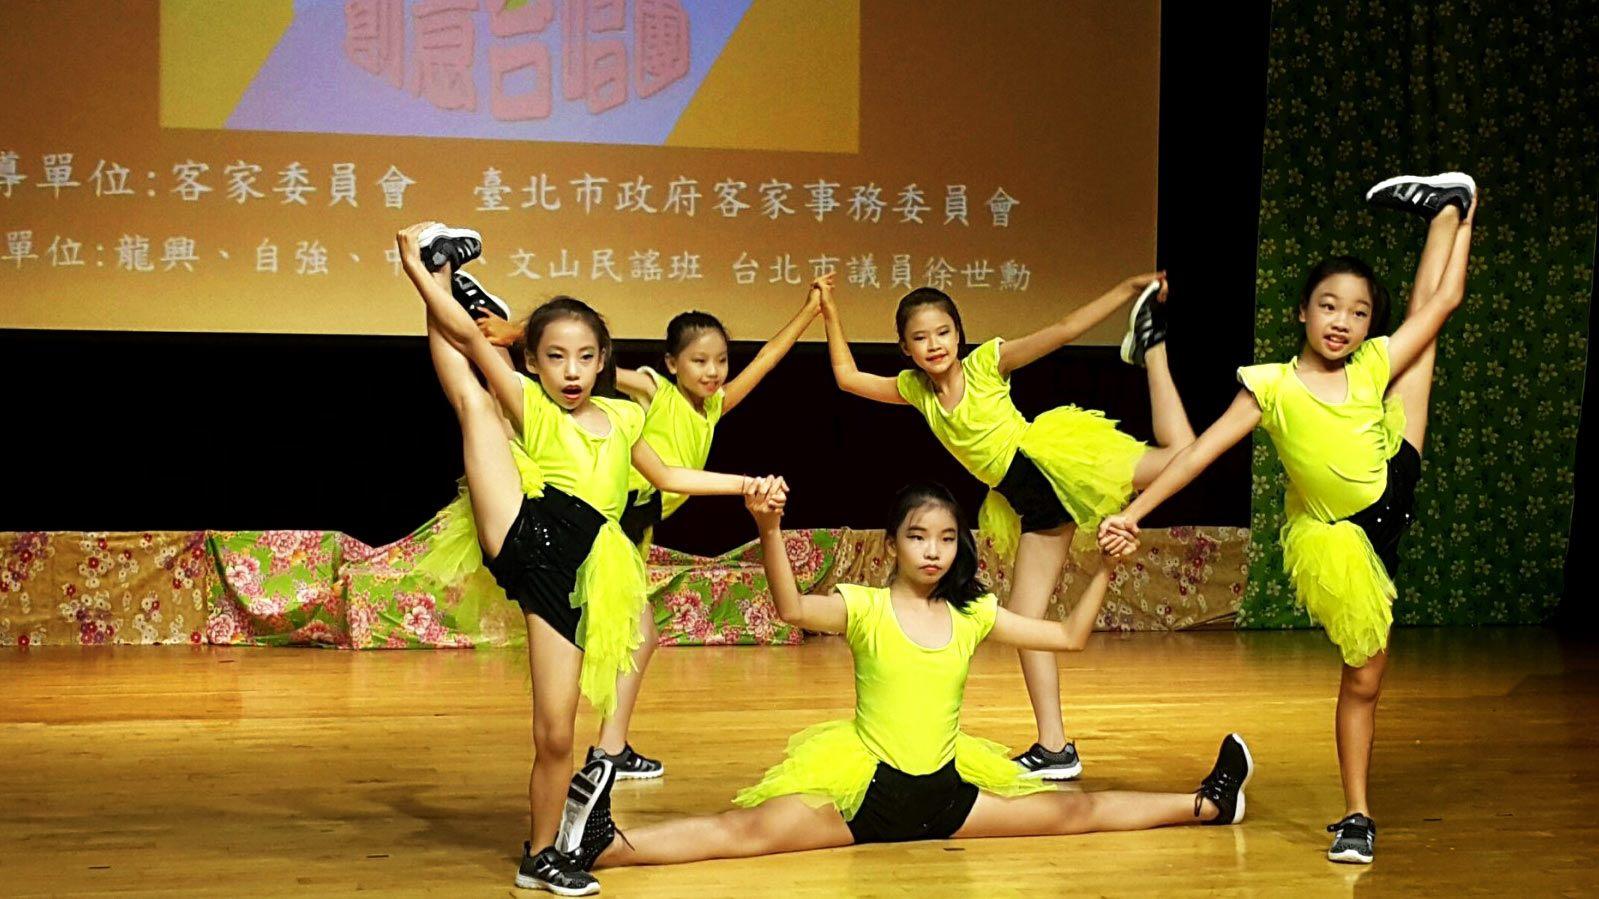 Happy Girls showing Ballet dance movement